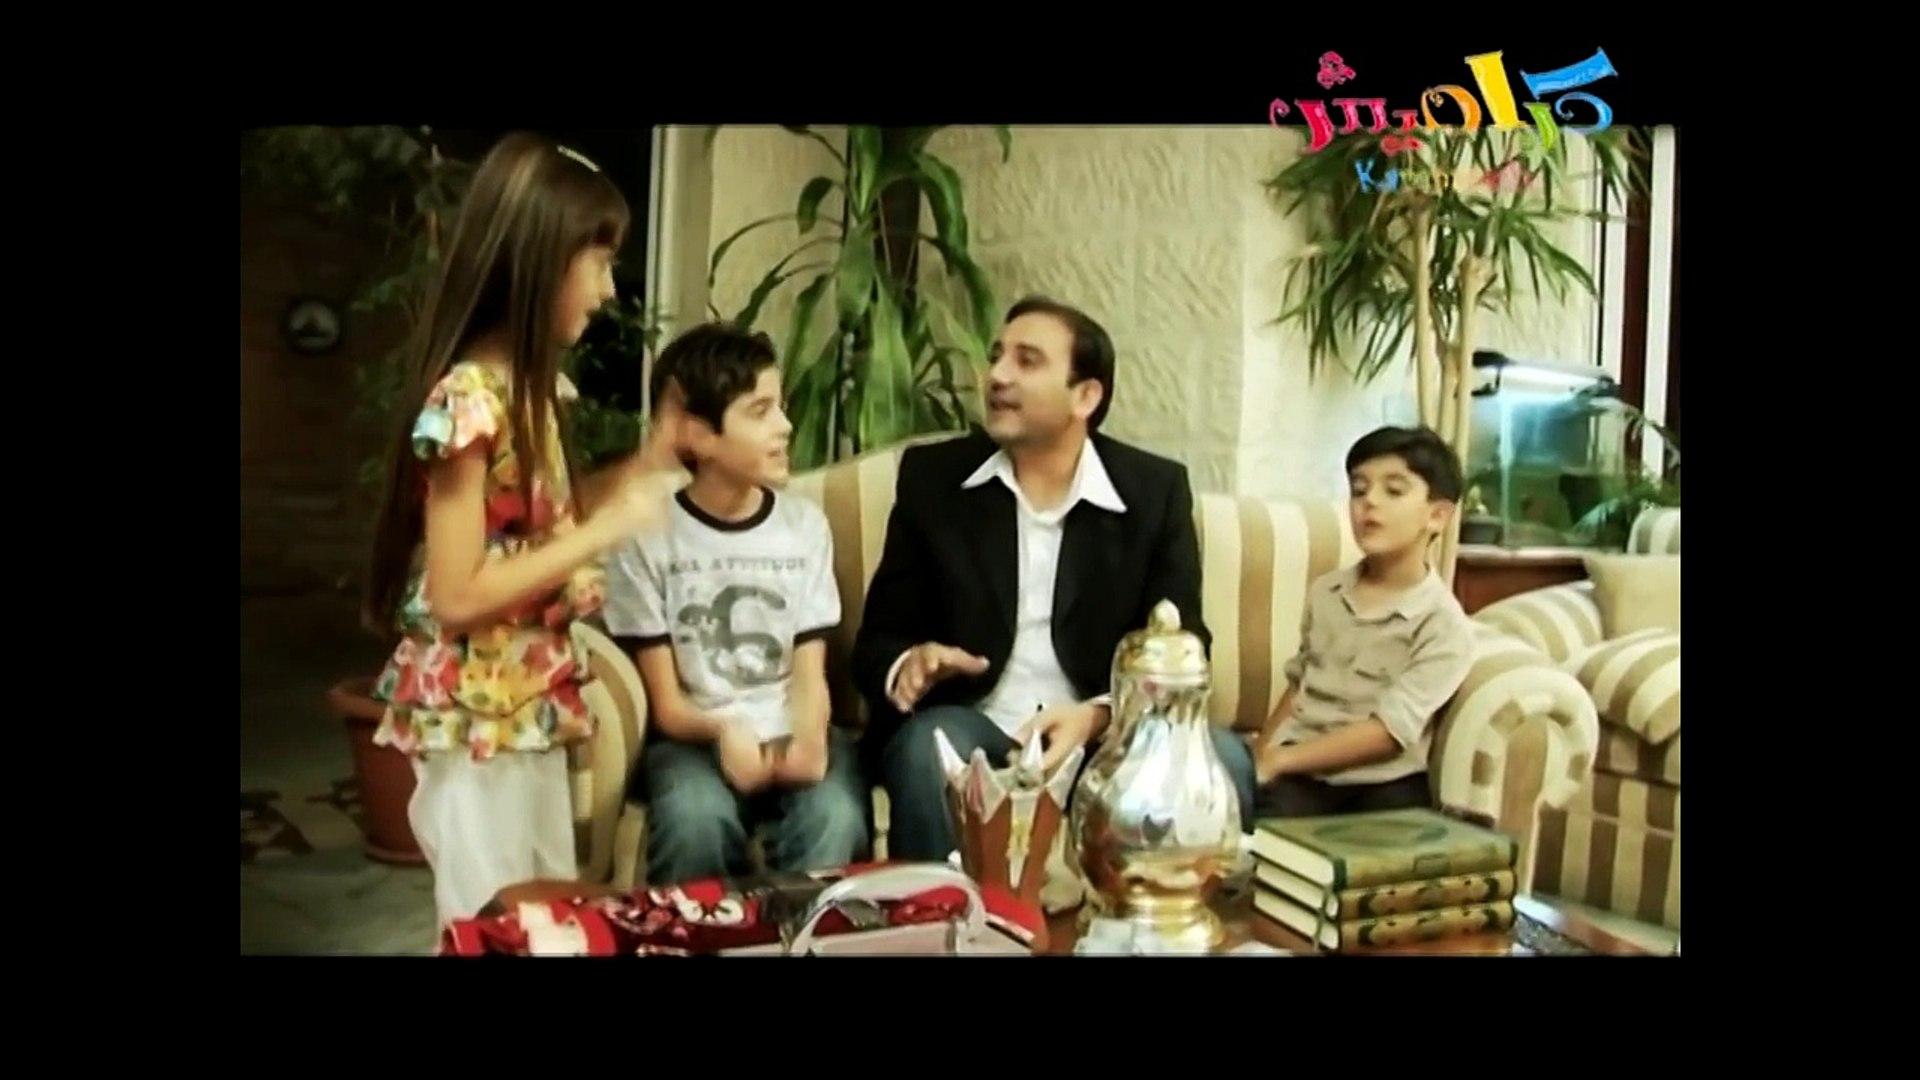 طلة رمضان موسى مصطفى قناة كراميش الفضائية Karameesh Tv Video Dailymotion